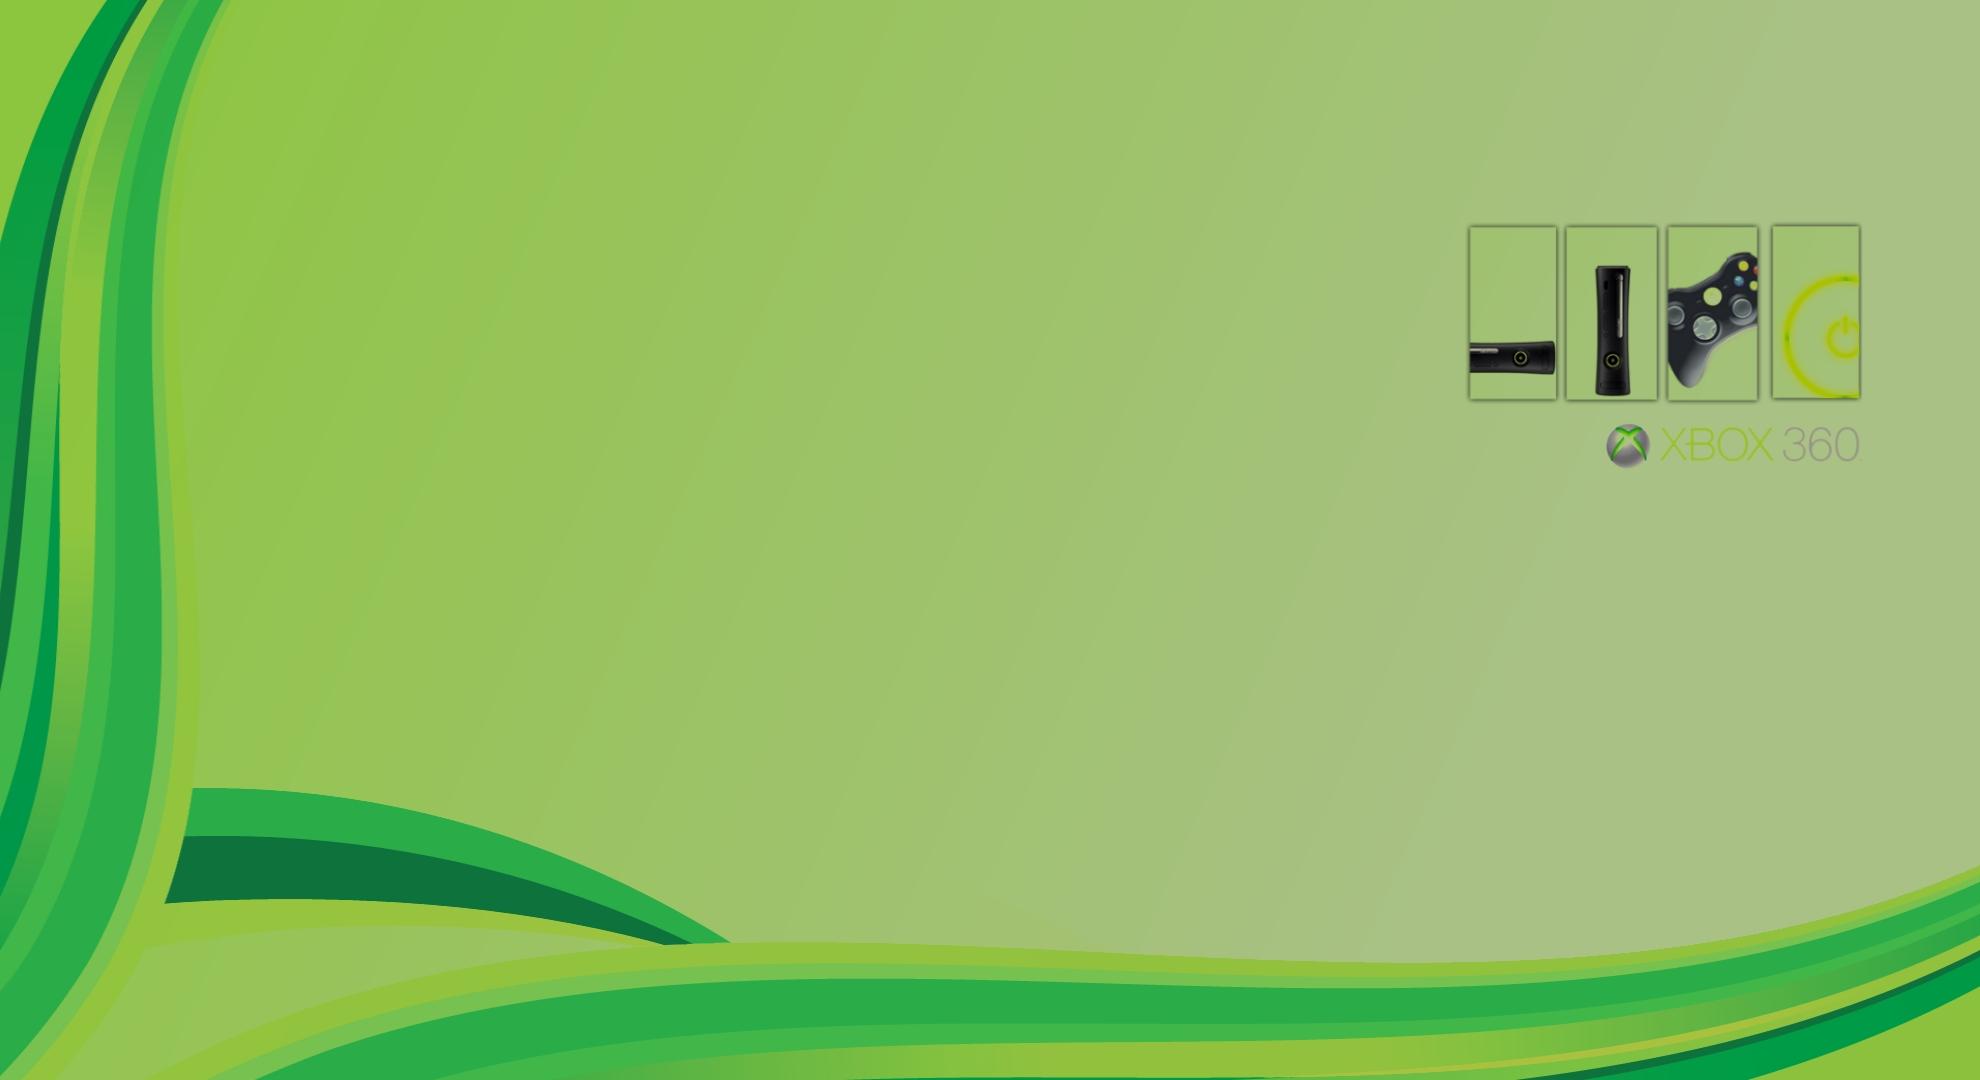 xbox one dashboard wallpaper - wallpapersafari